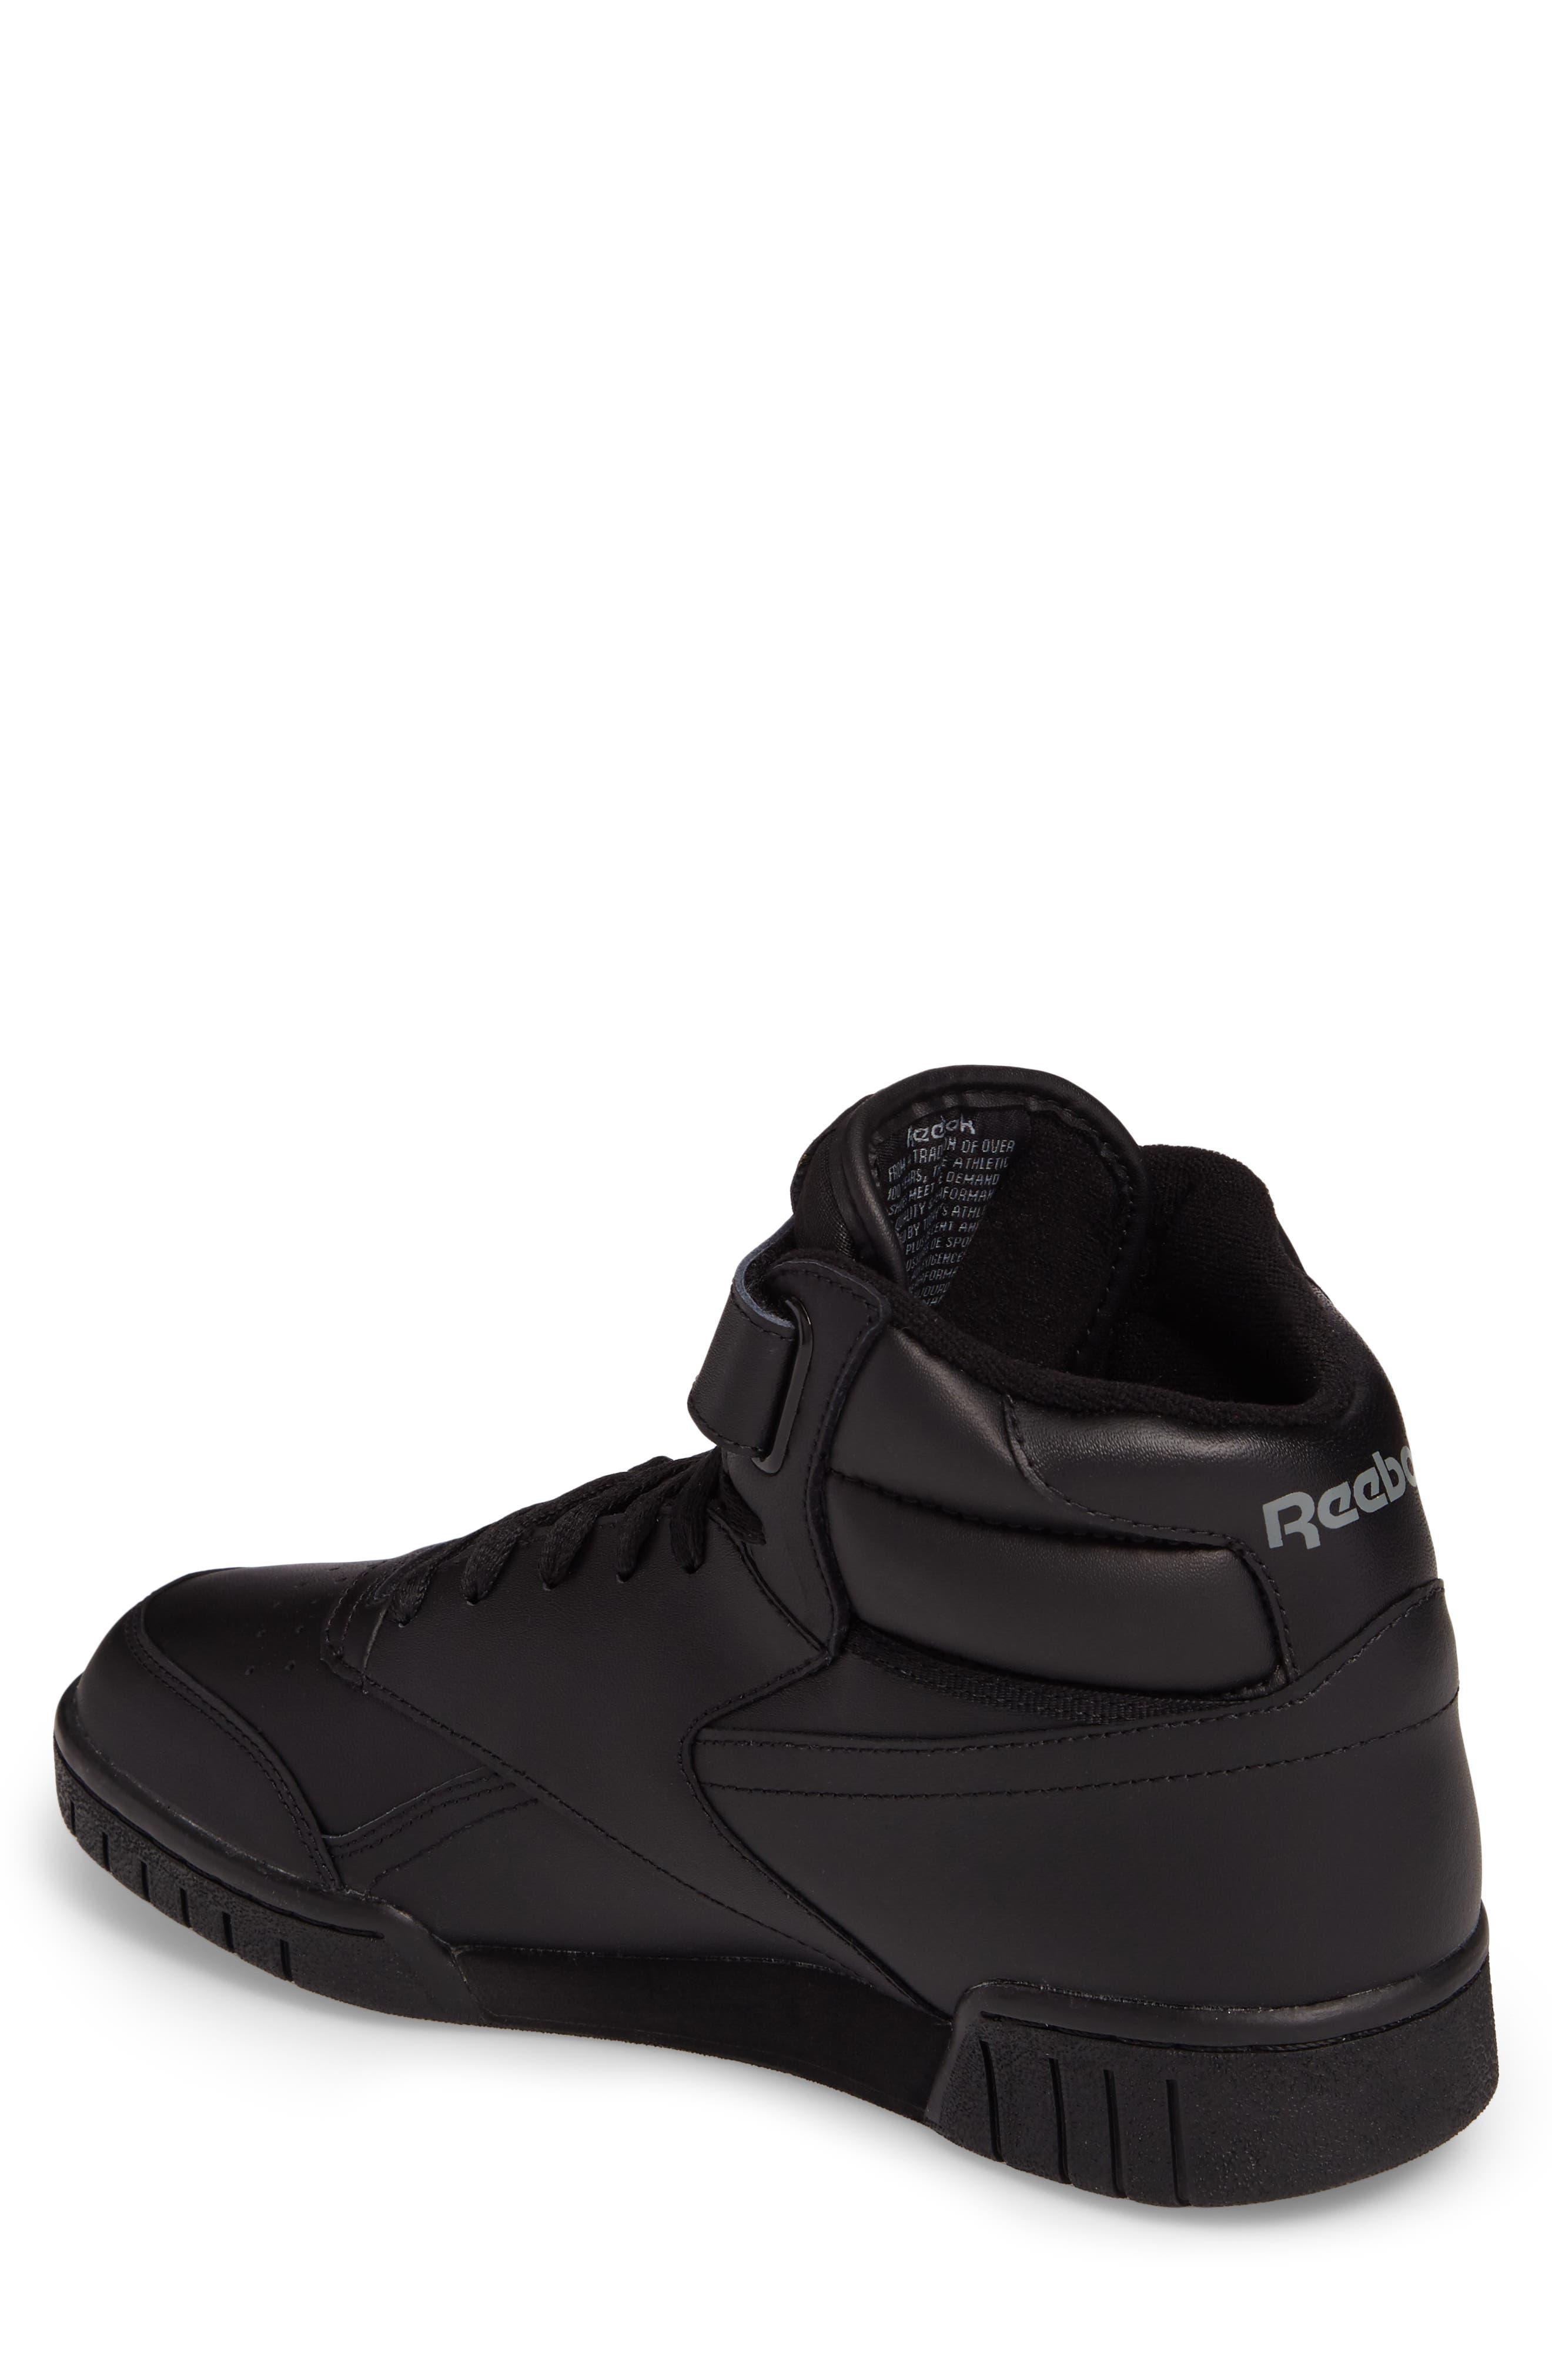 Ex-O-Fit Hi Sneaker,                             Alternate thumbnail 2, color,                             Black